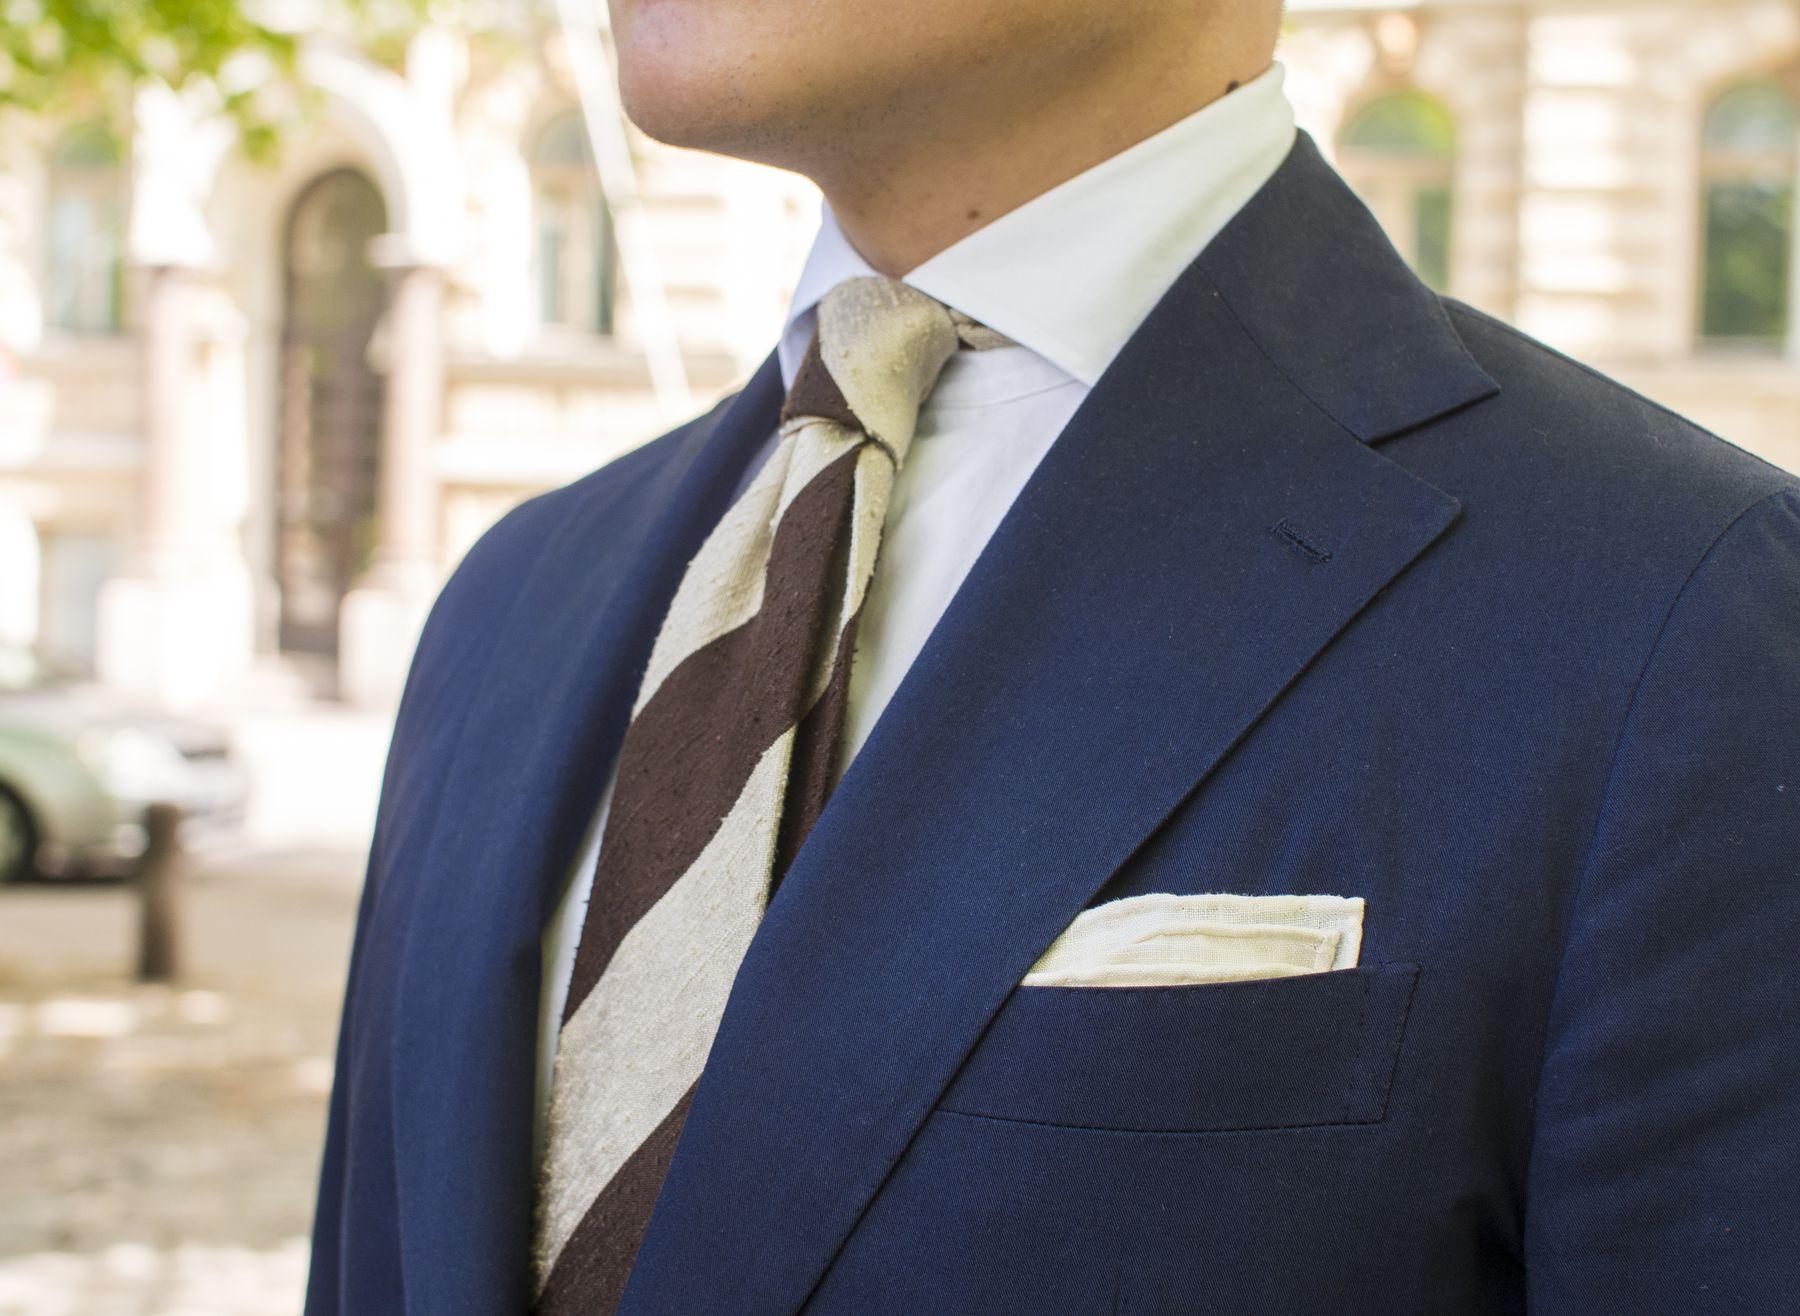 Choosing a Suit for a Summer Wedding